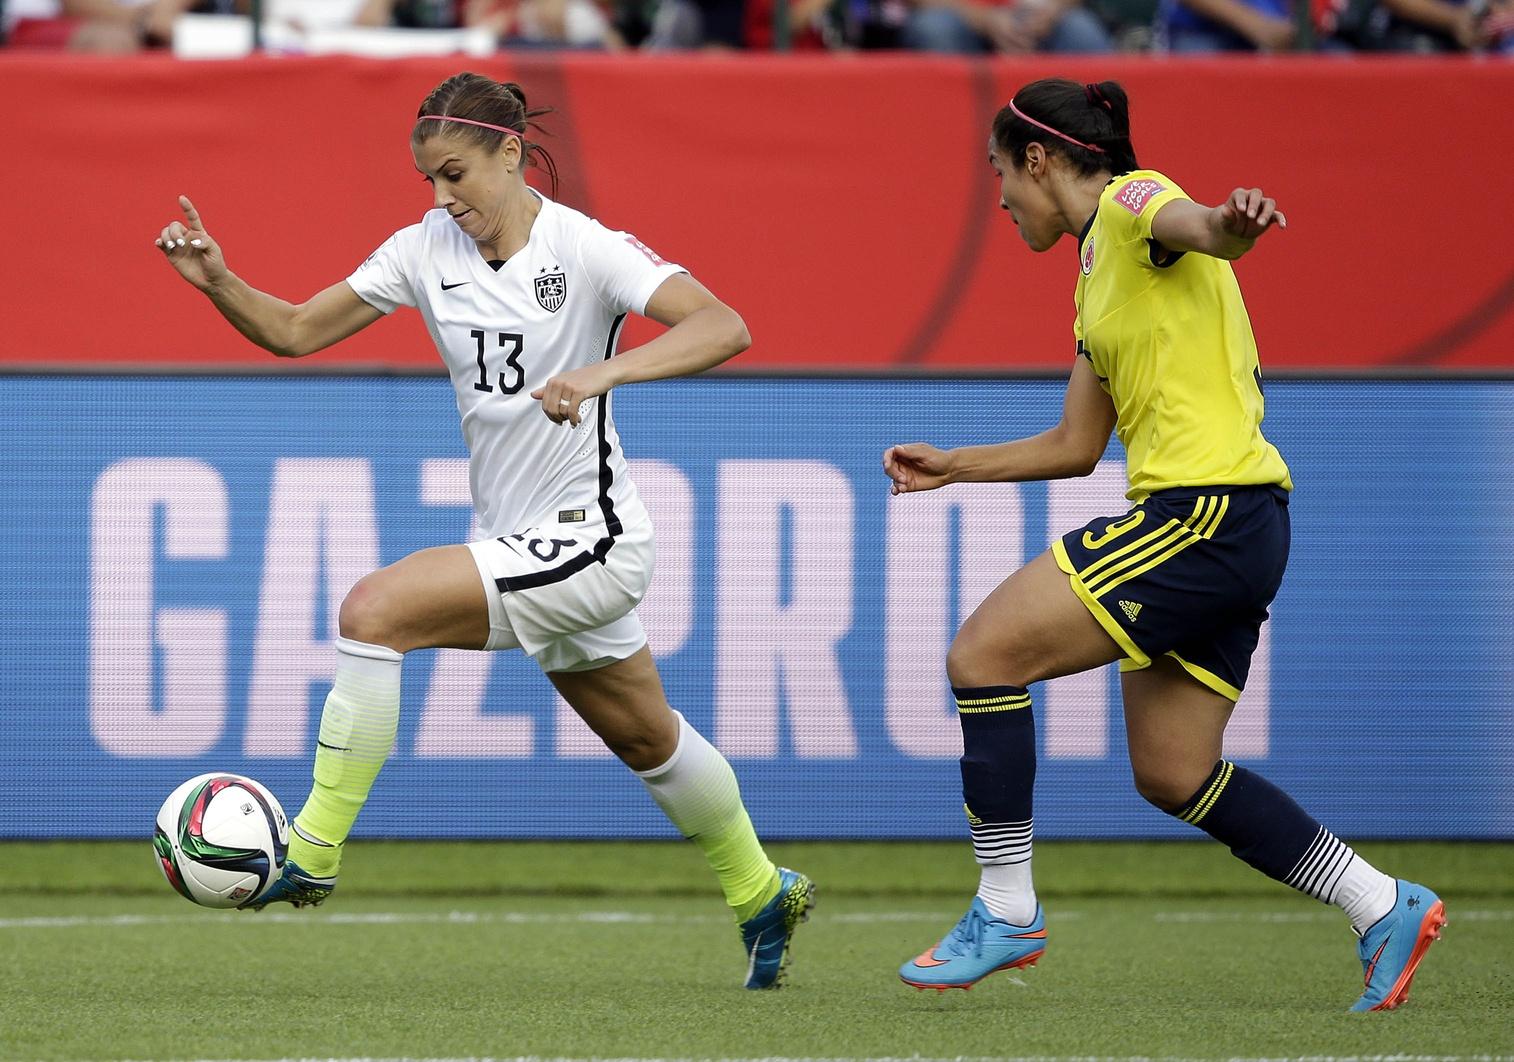 Photo by Erich Schlegel/USA TODAY Sports